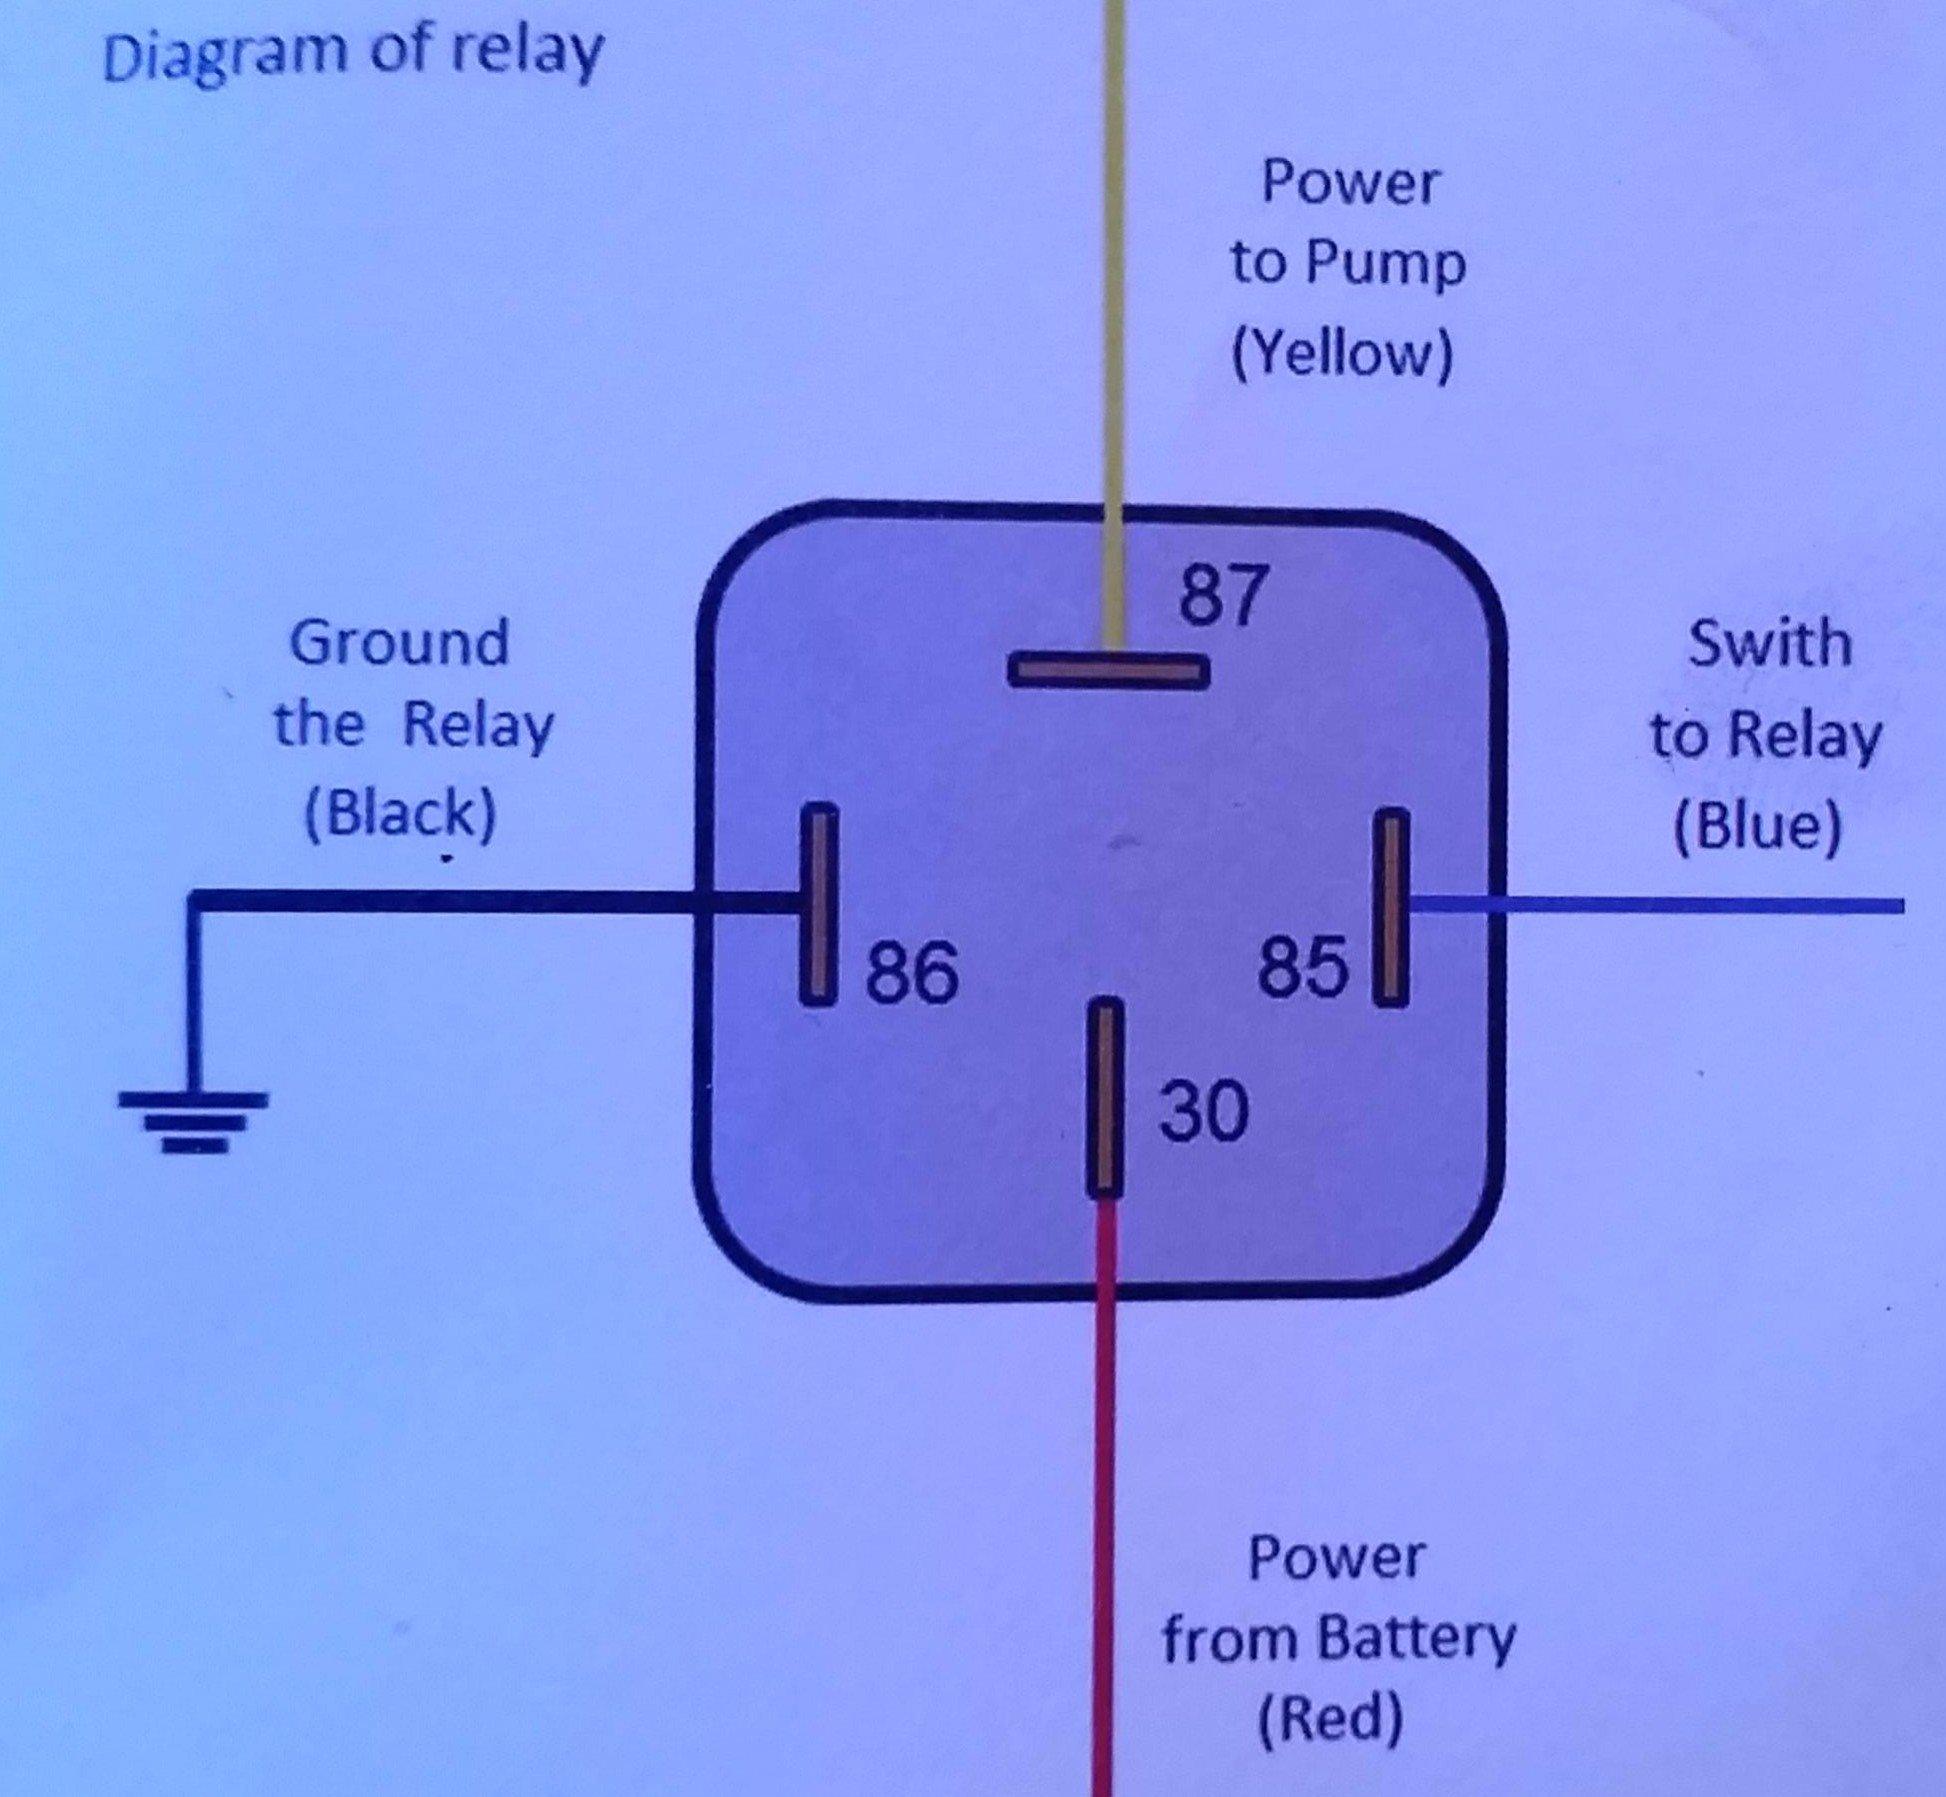 [TVPR_3874]  BR_0578] Negative Fuel Pump Relay Wiring Diagram Get Free Image About Wiring  Wiring Diagram | Bosch Fuel Pump Relay Wire Diagram |  | Phon Opein Lotap Omit Hyedi Mohammedshrine Librar Wiring 101